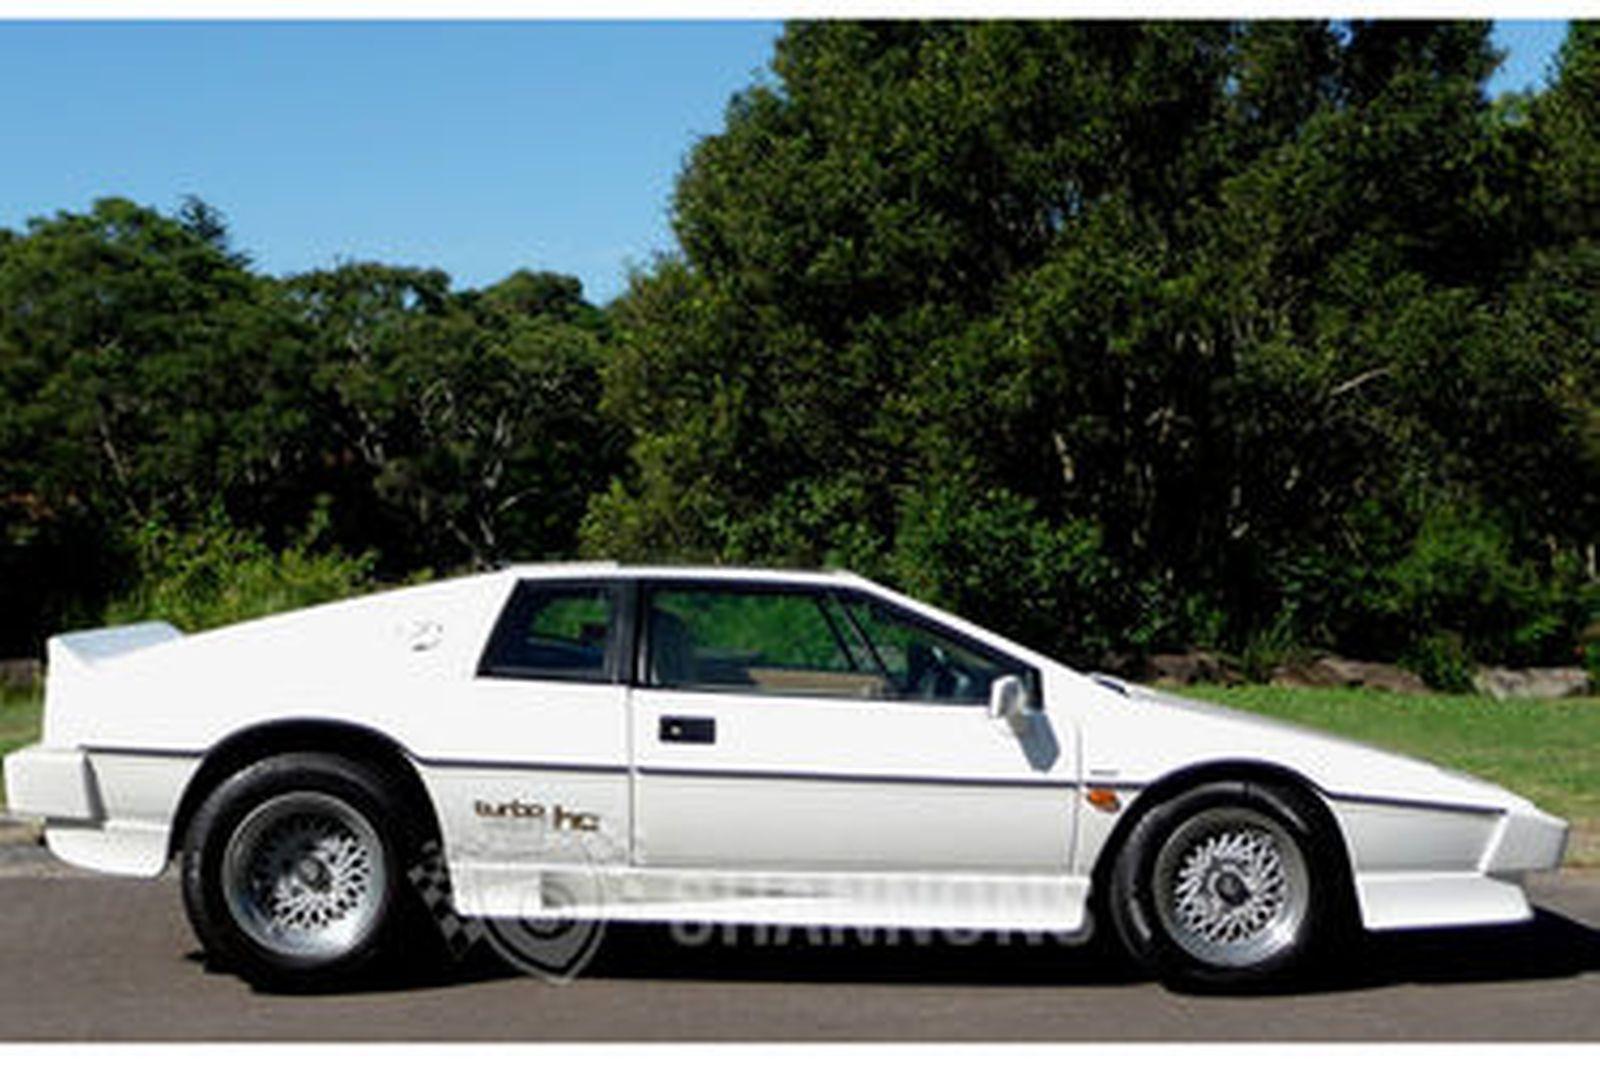 Lotus Esprit Turbo Hc Coupe on Lotus Esprit 4 Cylinder Engine